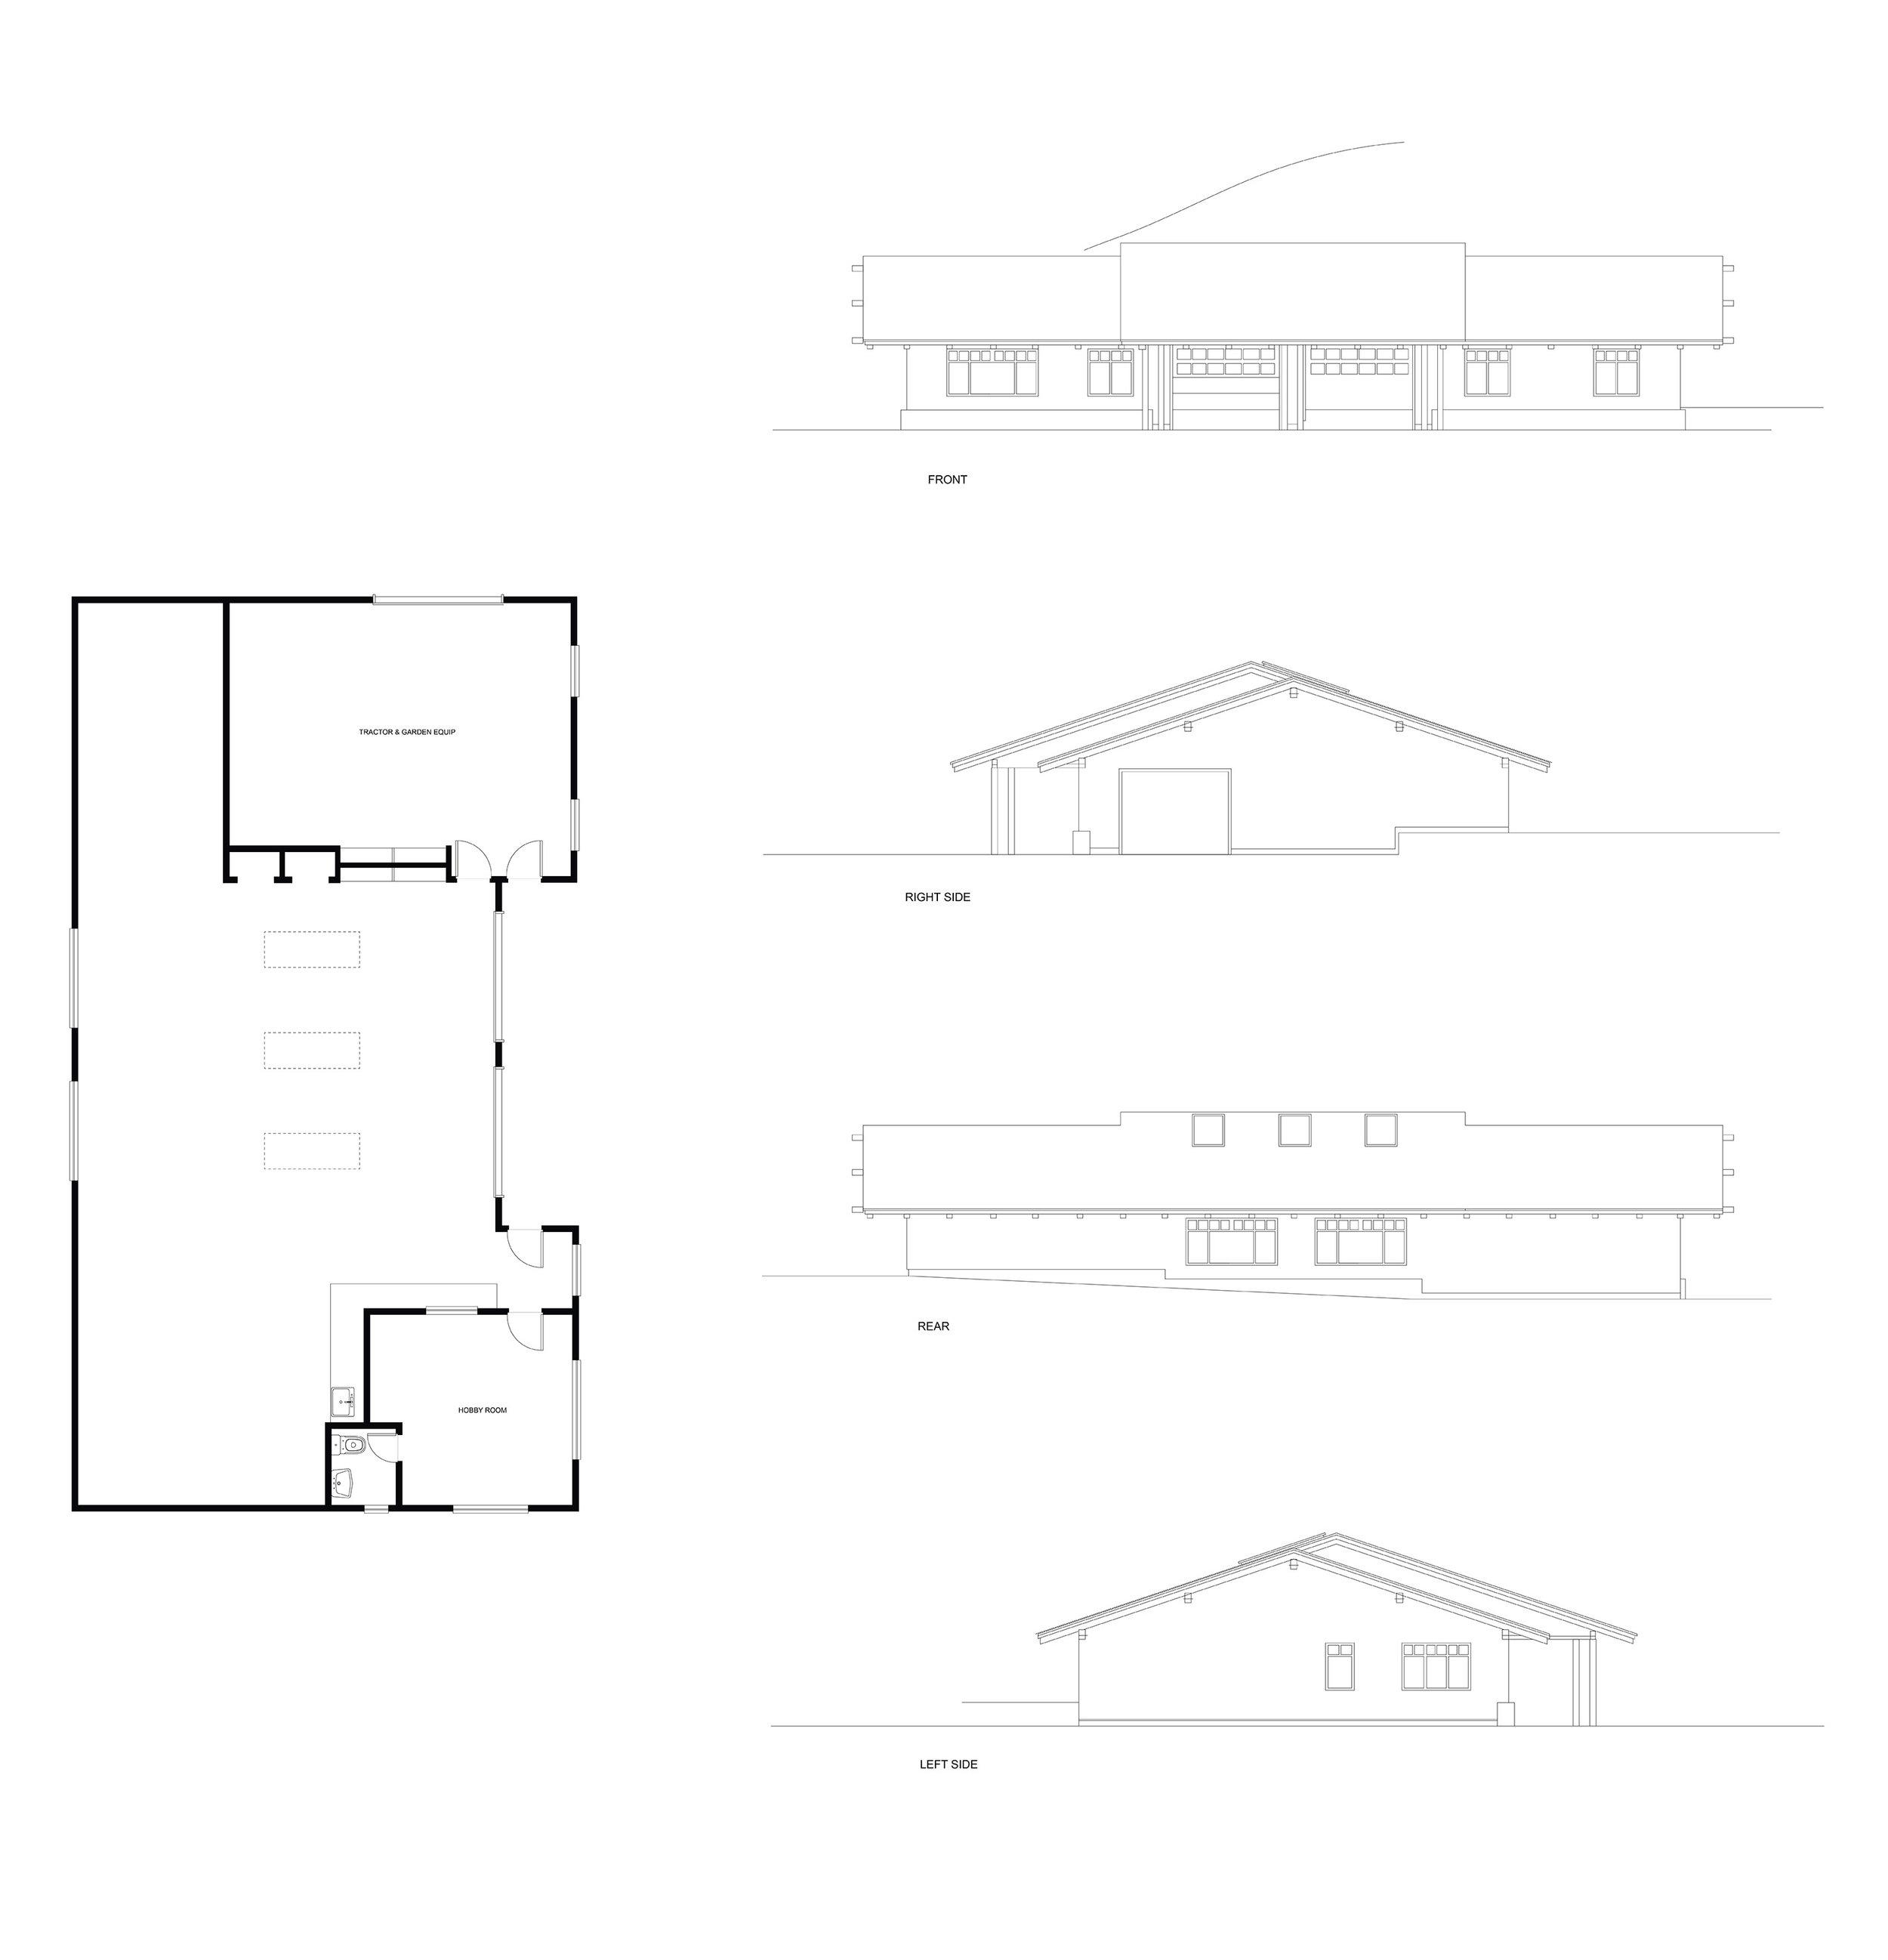 Garage Elevations & Floorplan